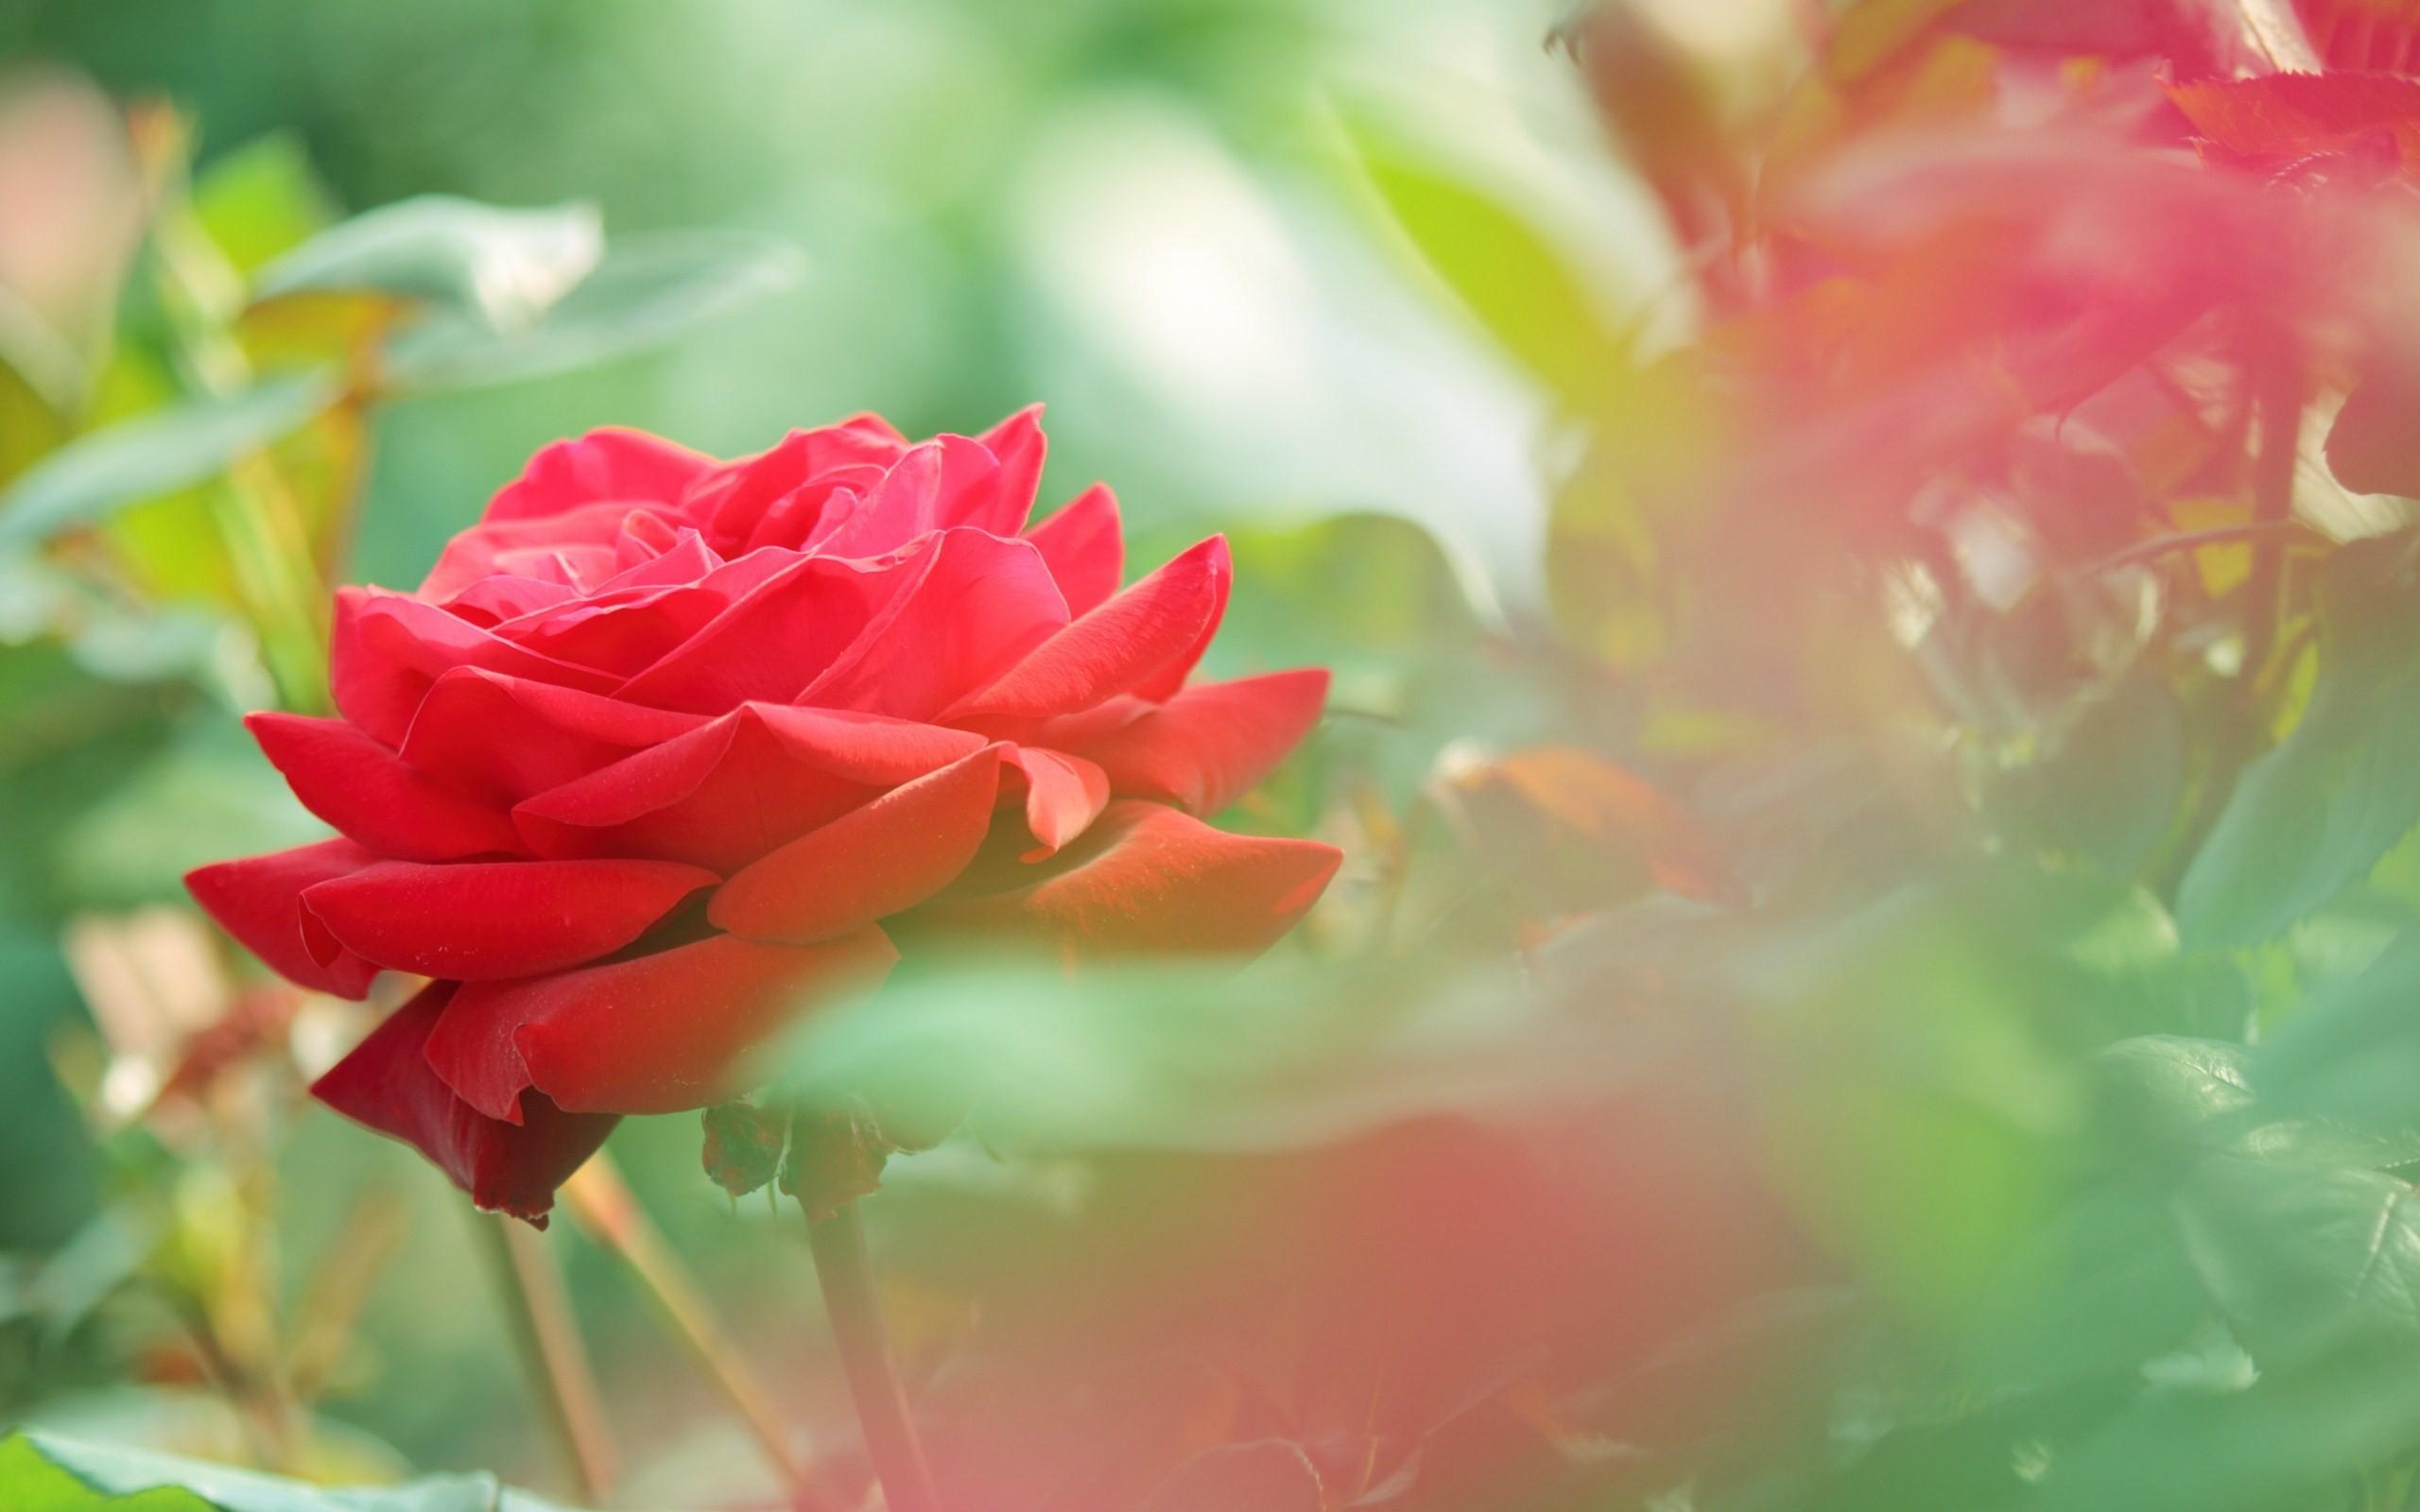 Beautiful roses wallpapers 2560x1600 beautiful red rose flower photo hd wallpaper download beautiful izmirmasajfo